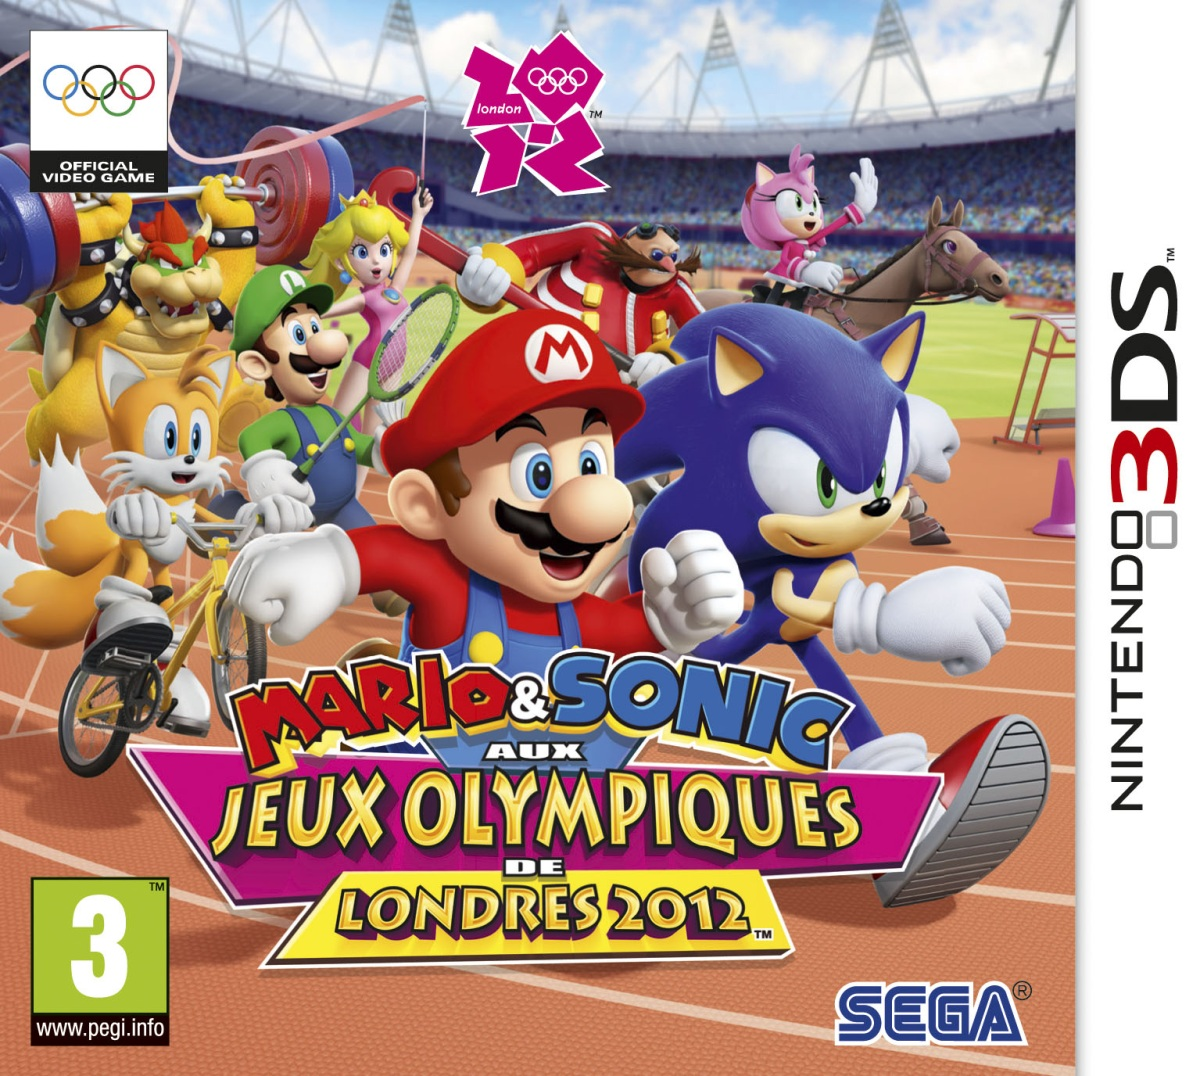 Mario-SonicauxJeuxOlympiquesdeLondres2012 3DS Jaquette 002